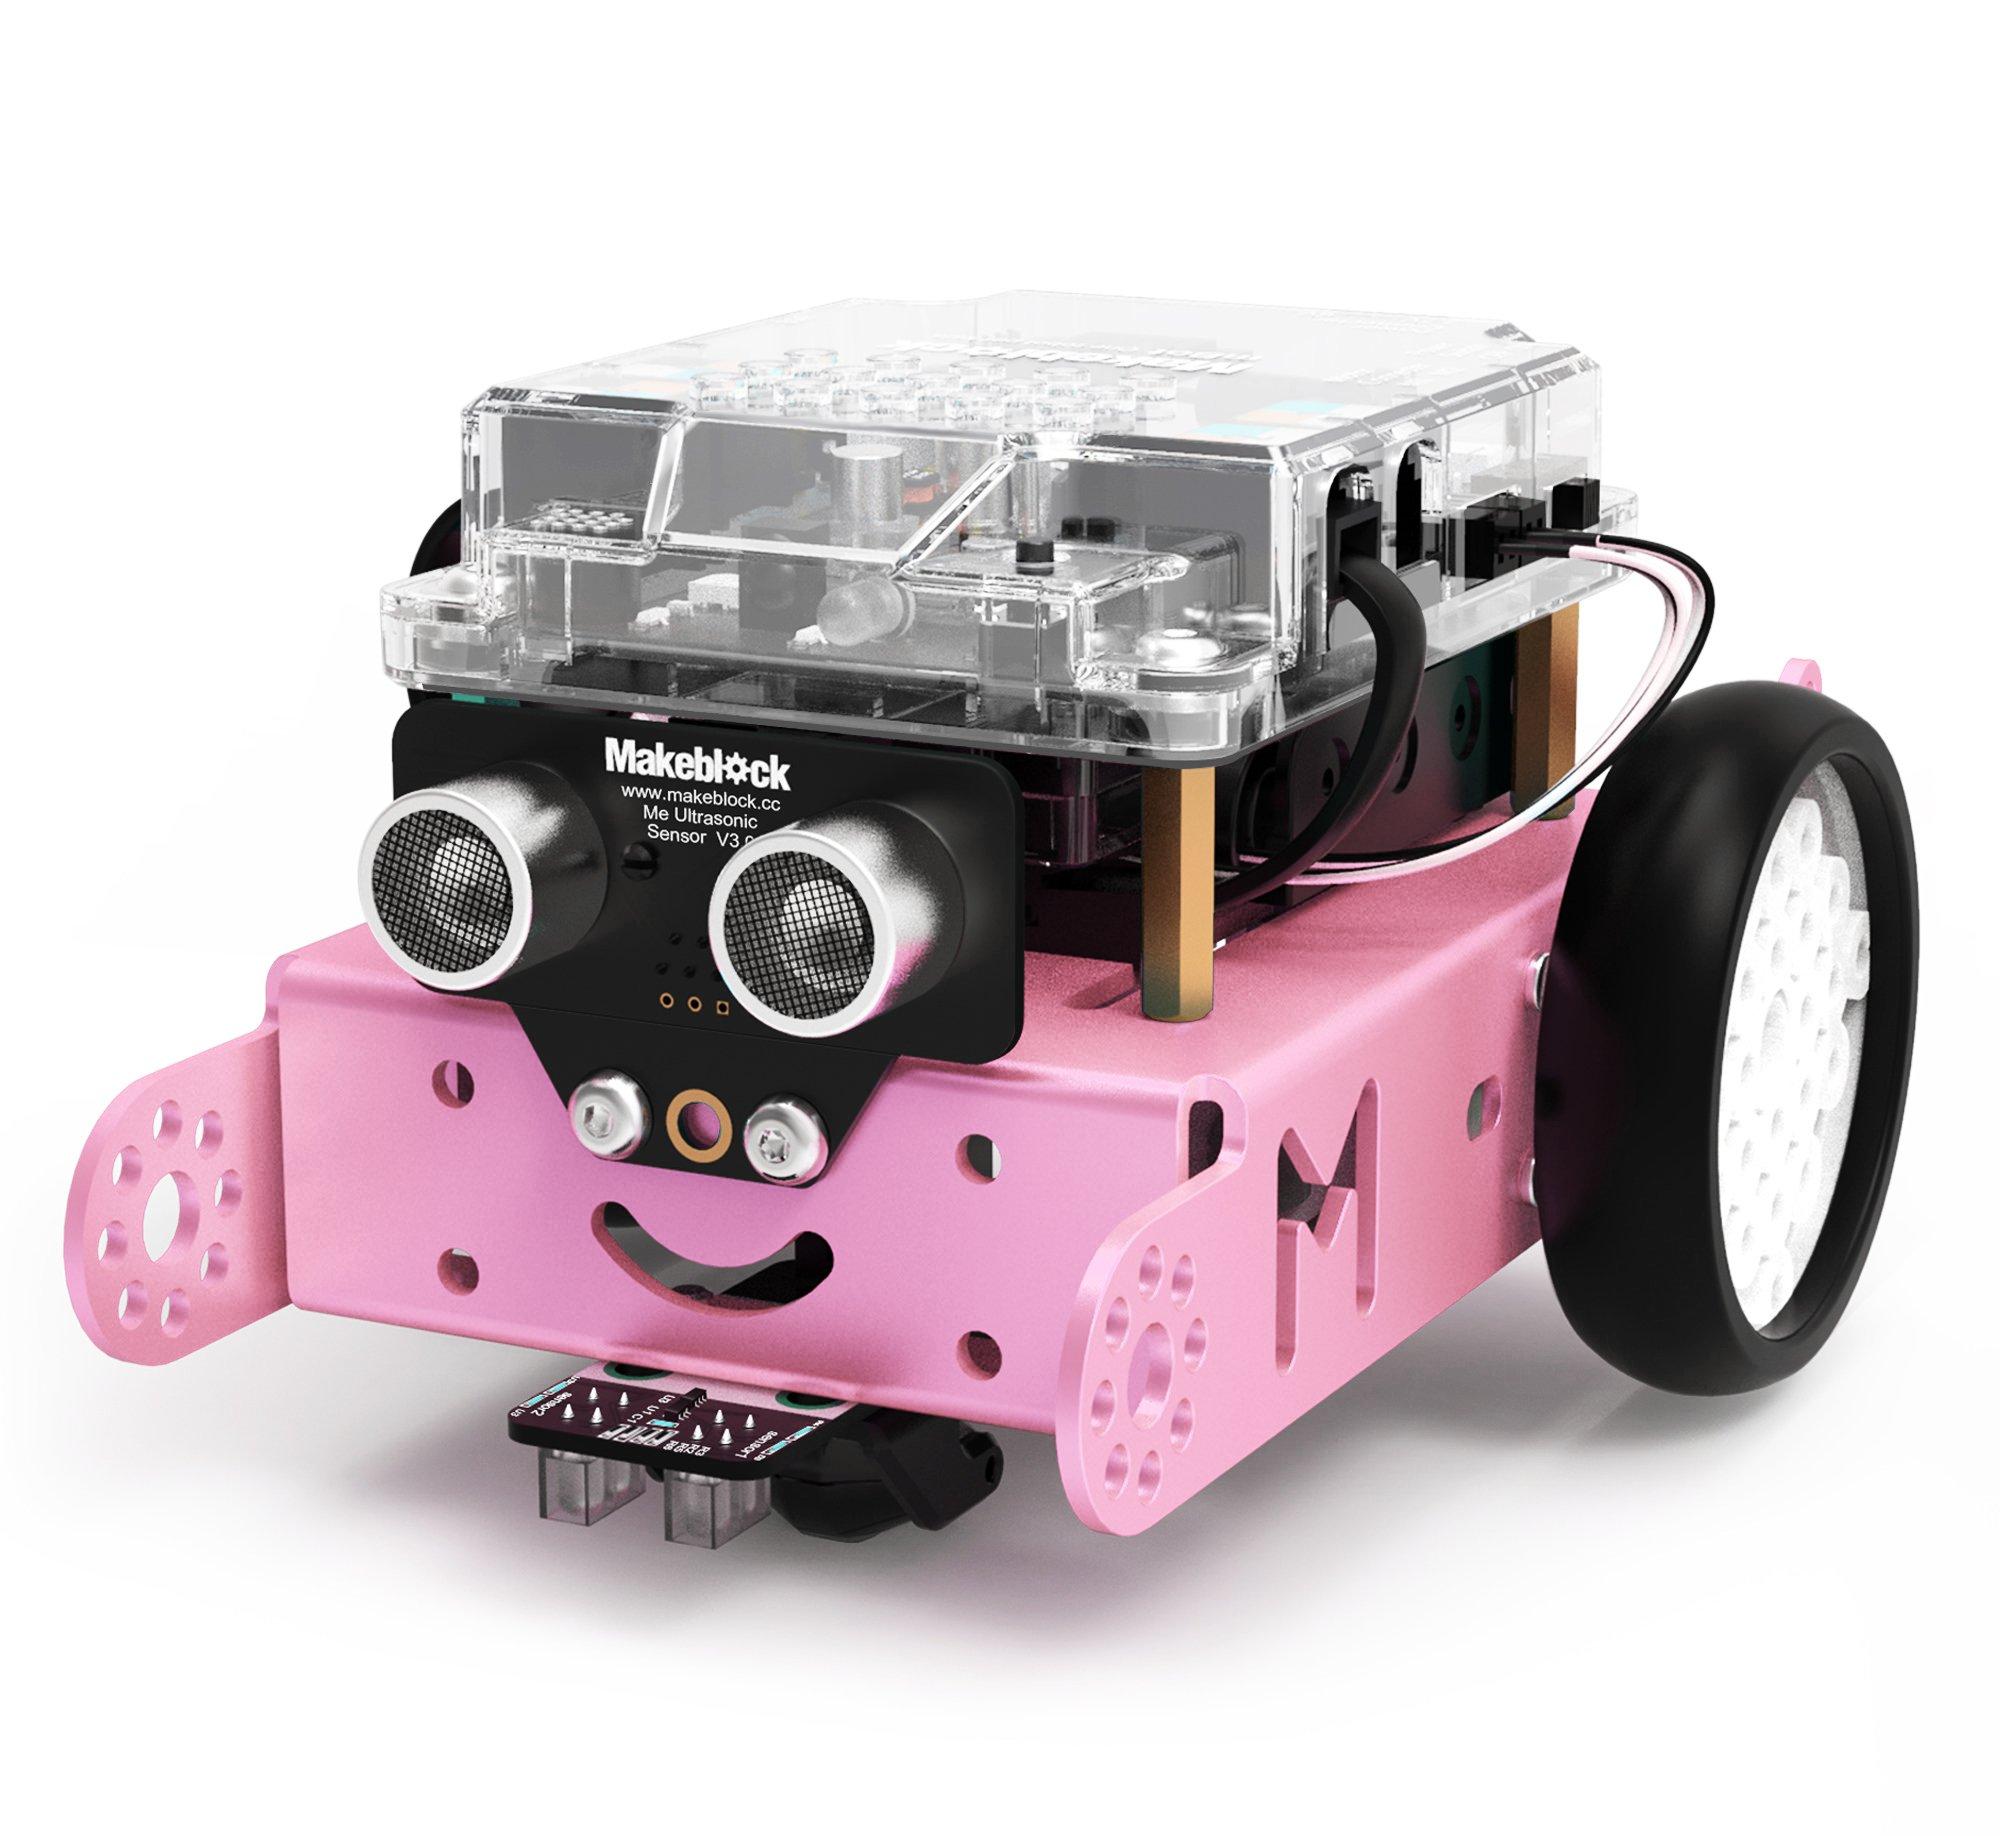 Makeblock mBot Robot Kit, DIY Mechanical Building Block, STEM Education, Entry-Level Programming Improves Kids' Logical Thinking and Creativity. (Pink, 2.4G Version, Classroom)